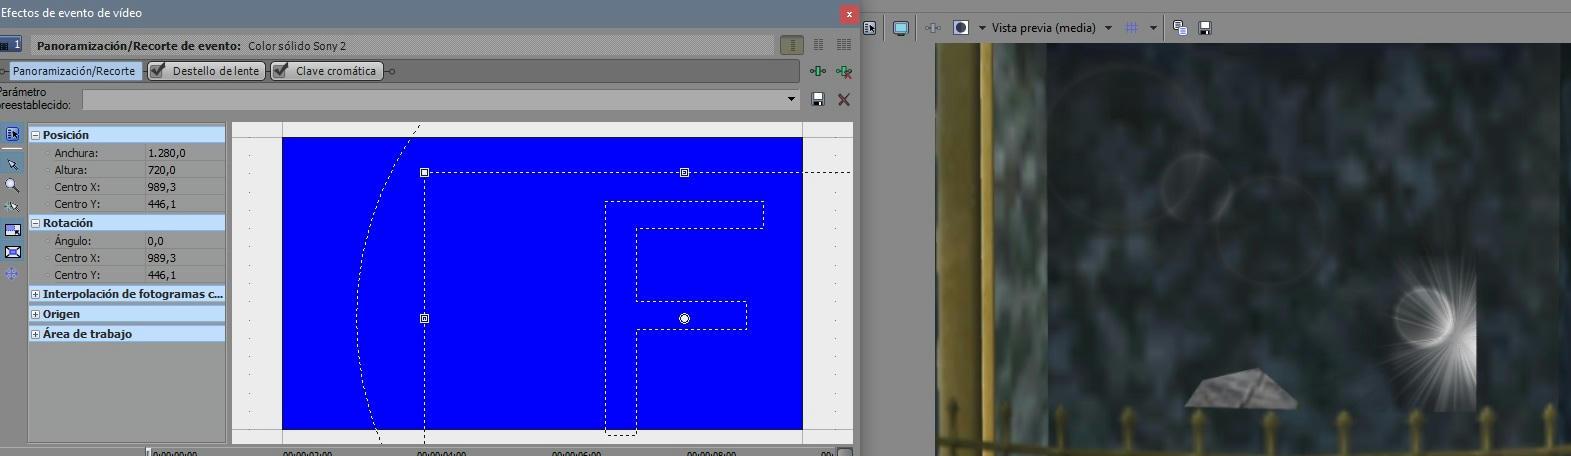 Tutorial Sony Vegas: Chroma key, uso eficaz y explicación 45k24d522lw08gbzg